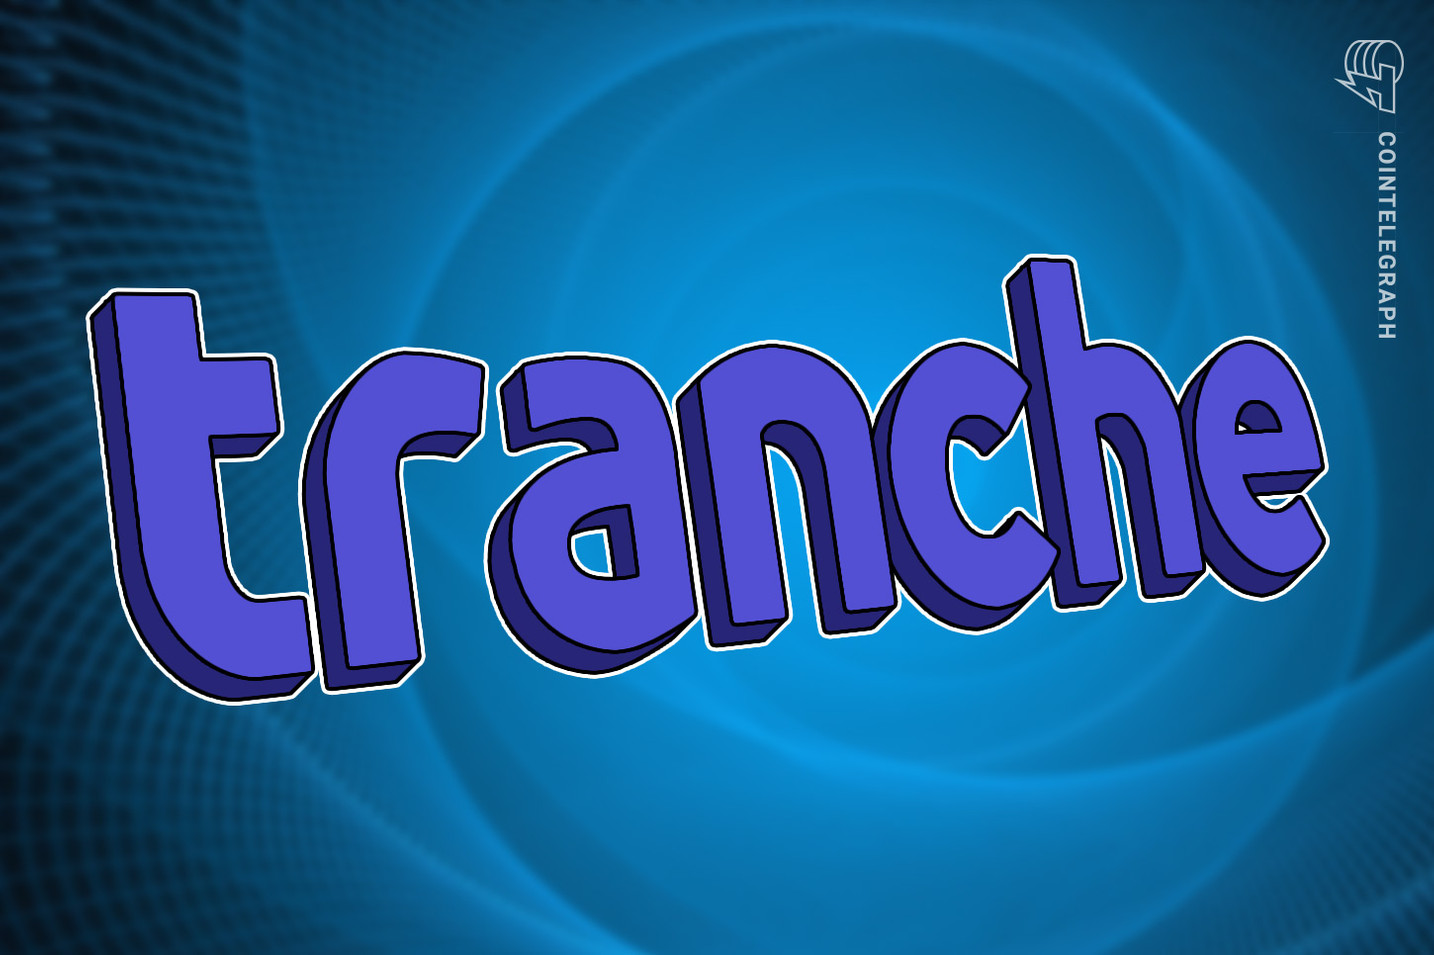 Tranche Finance launches as CDOs spearhead DeFi growth